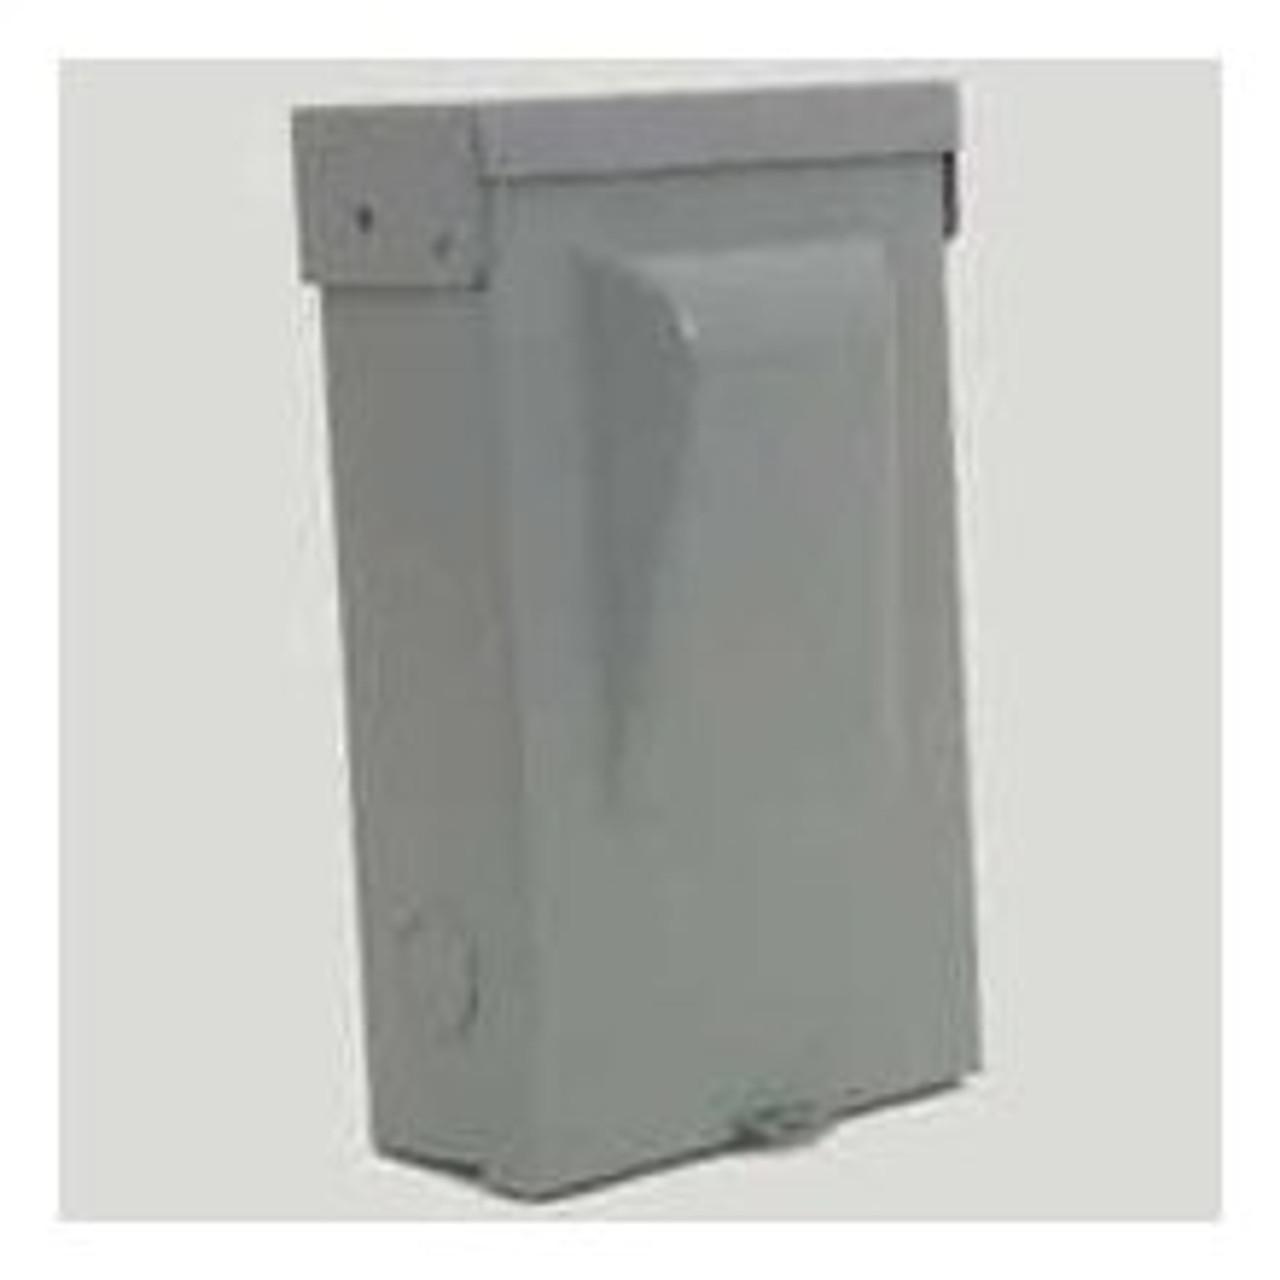 30 amp disconnect box mars mar80316 indoor comfort supply